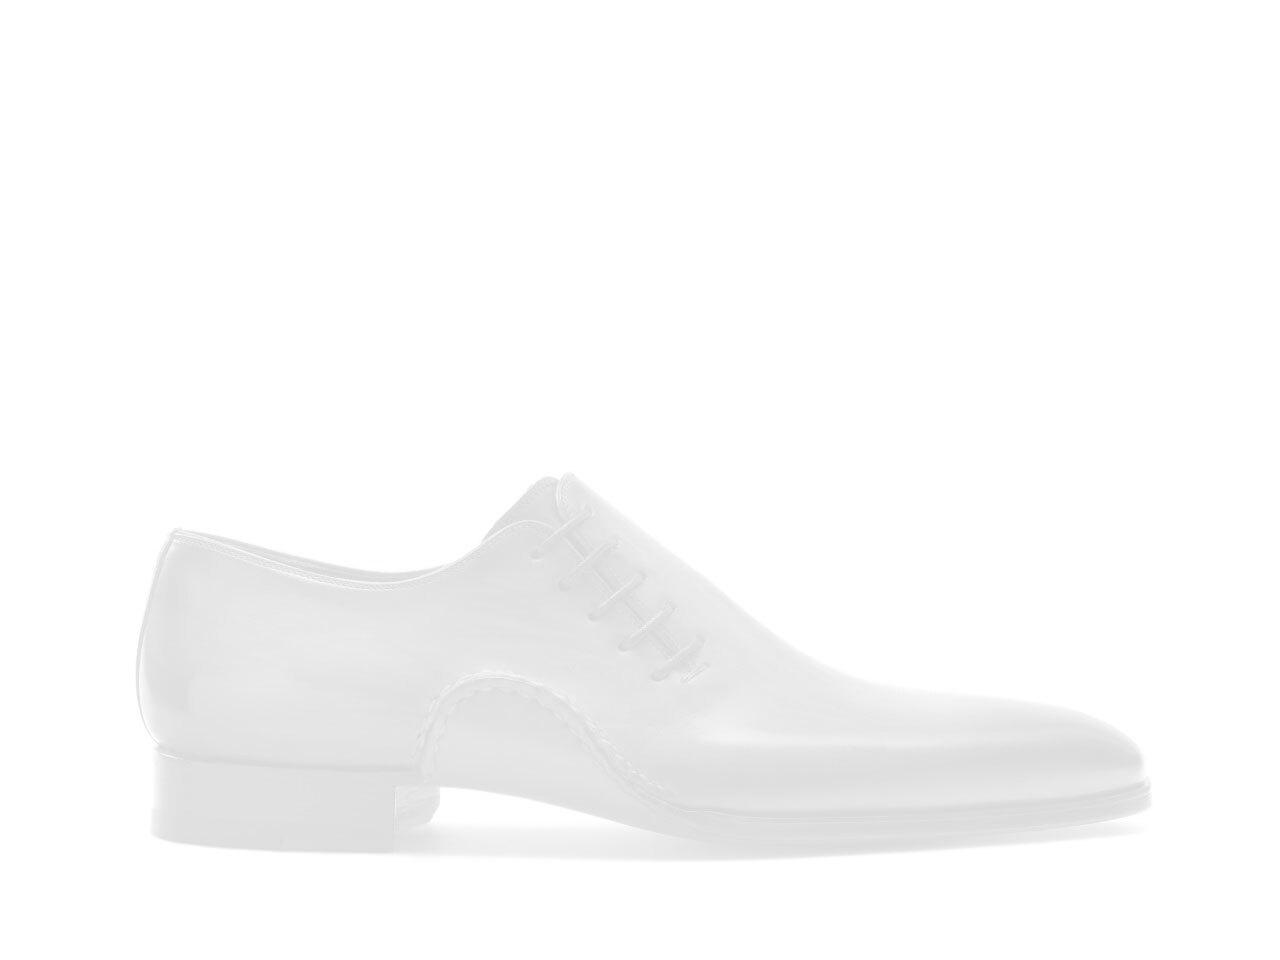 Pair of the Magnanni Jacoby II Cognac Men's Derby Shoes